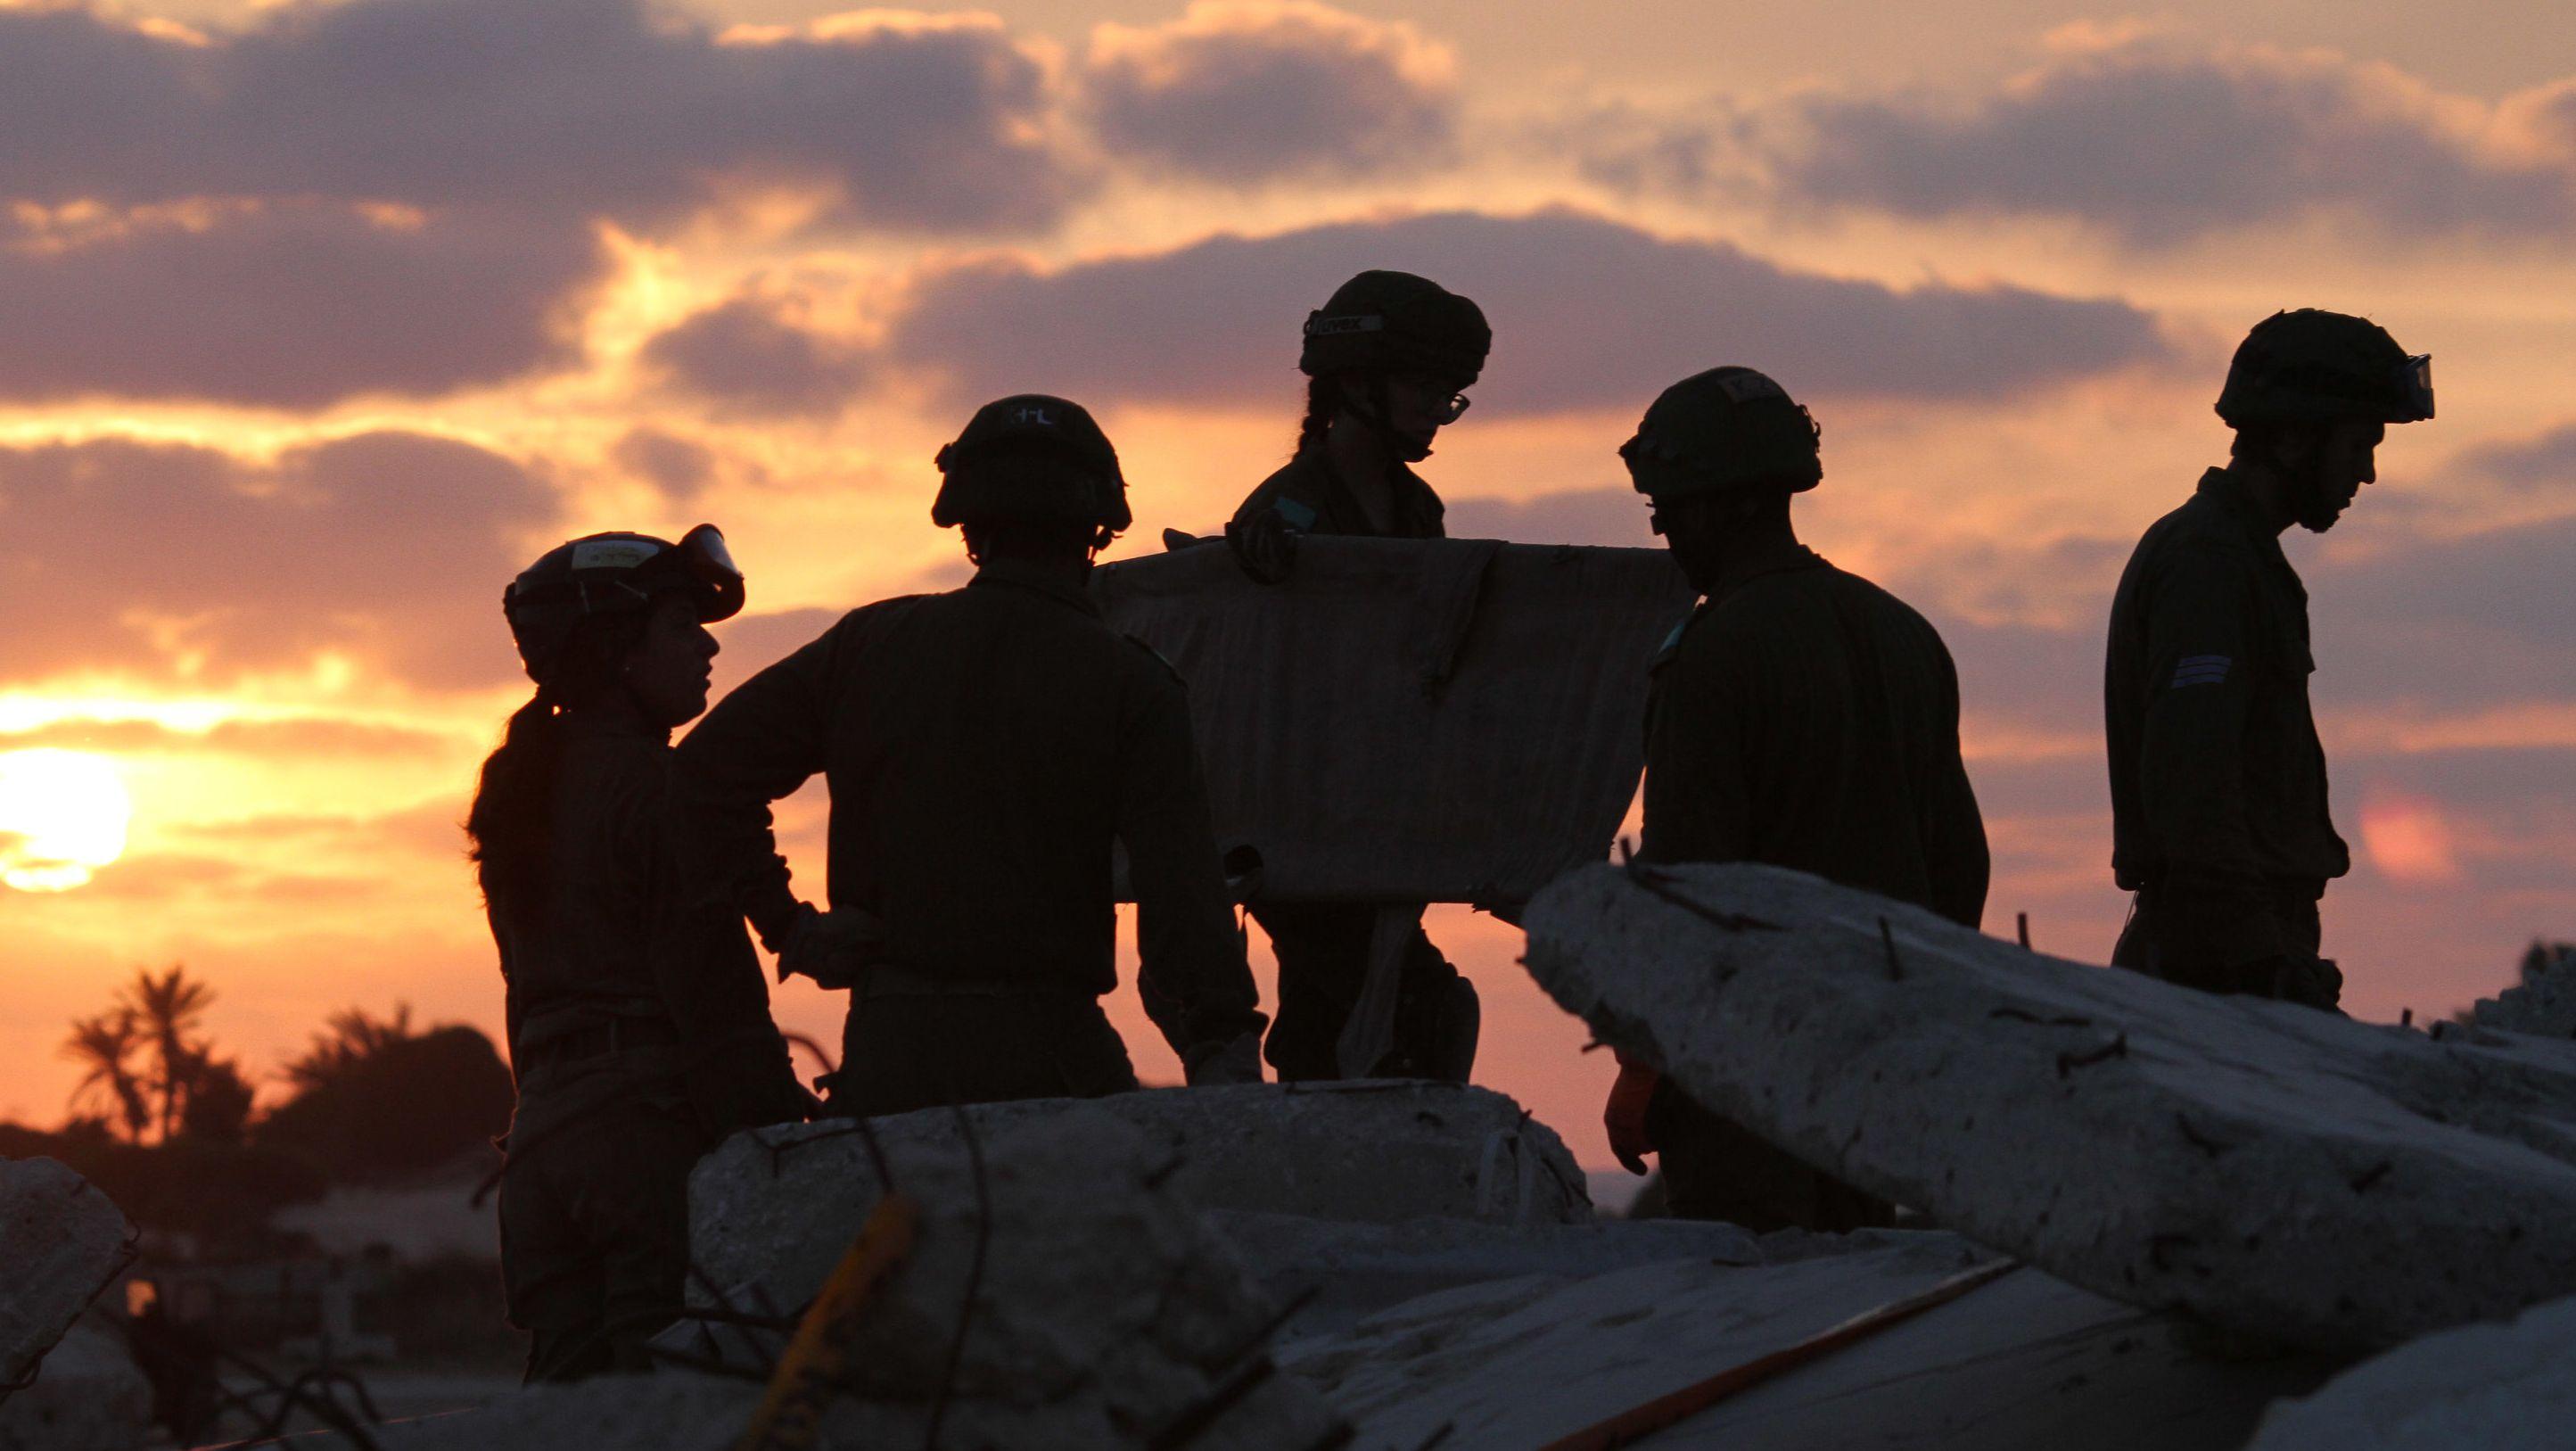 27.05.2019, Israel, Ashkelon: Israelische Soldaten nehmen an einer Rettungsübung auf dem Armeestützpunkt Zikkim teil. Foto: Gil Cohen Magen/XinHua/dpa +++ dpa-Bildfunk +++